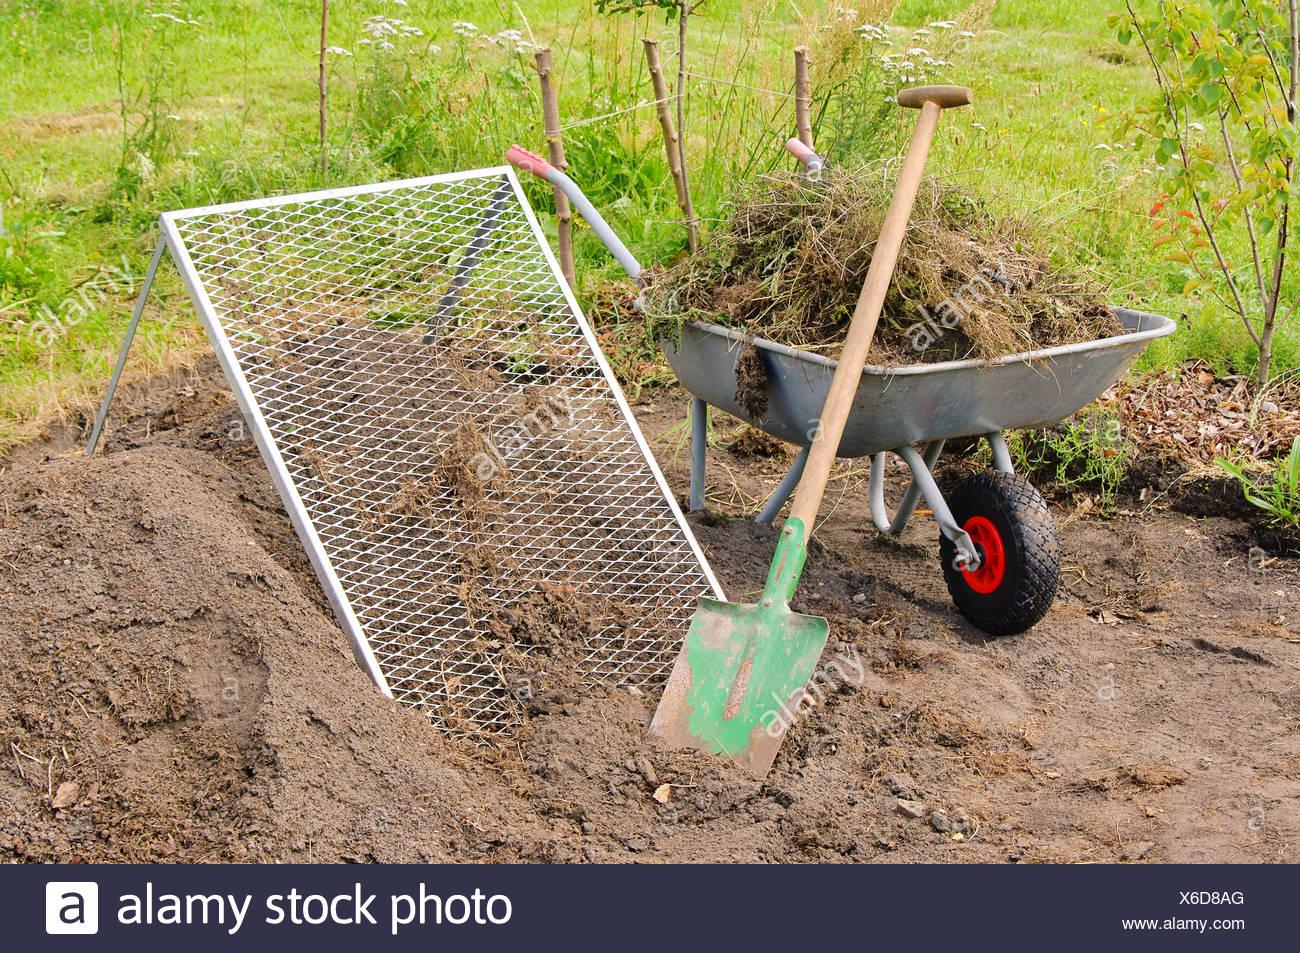 komposthaufen sieben - kompost-haufen sieb 01 stockfoto, bild